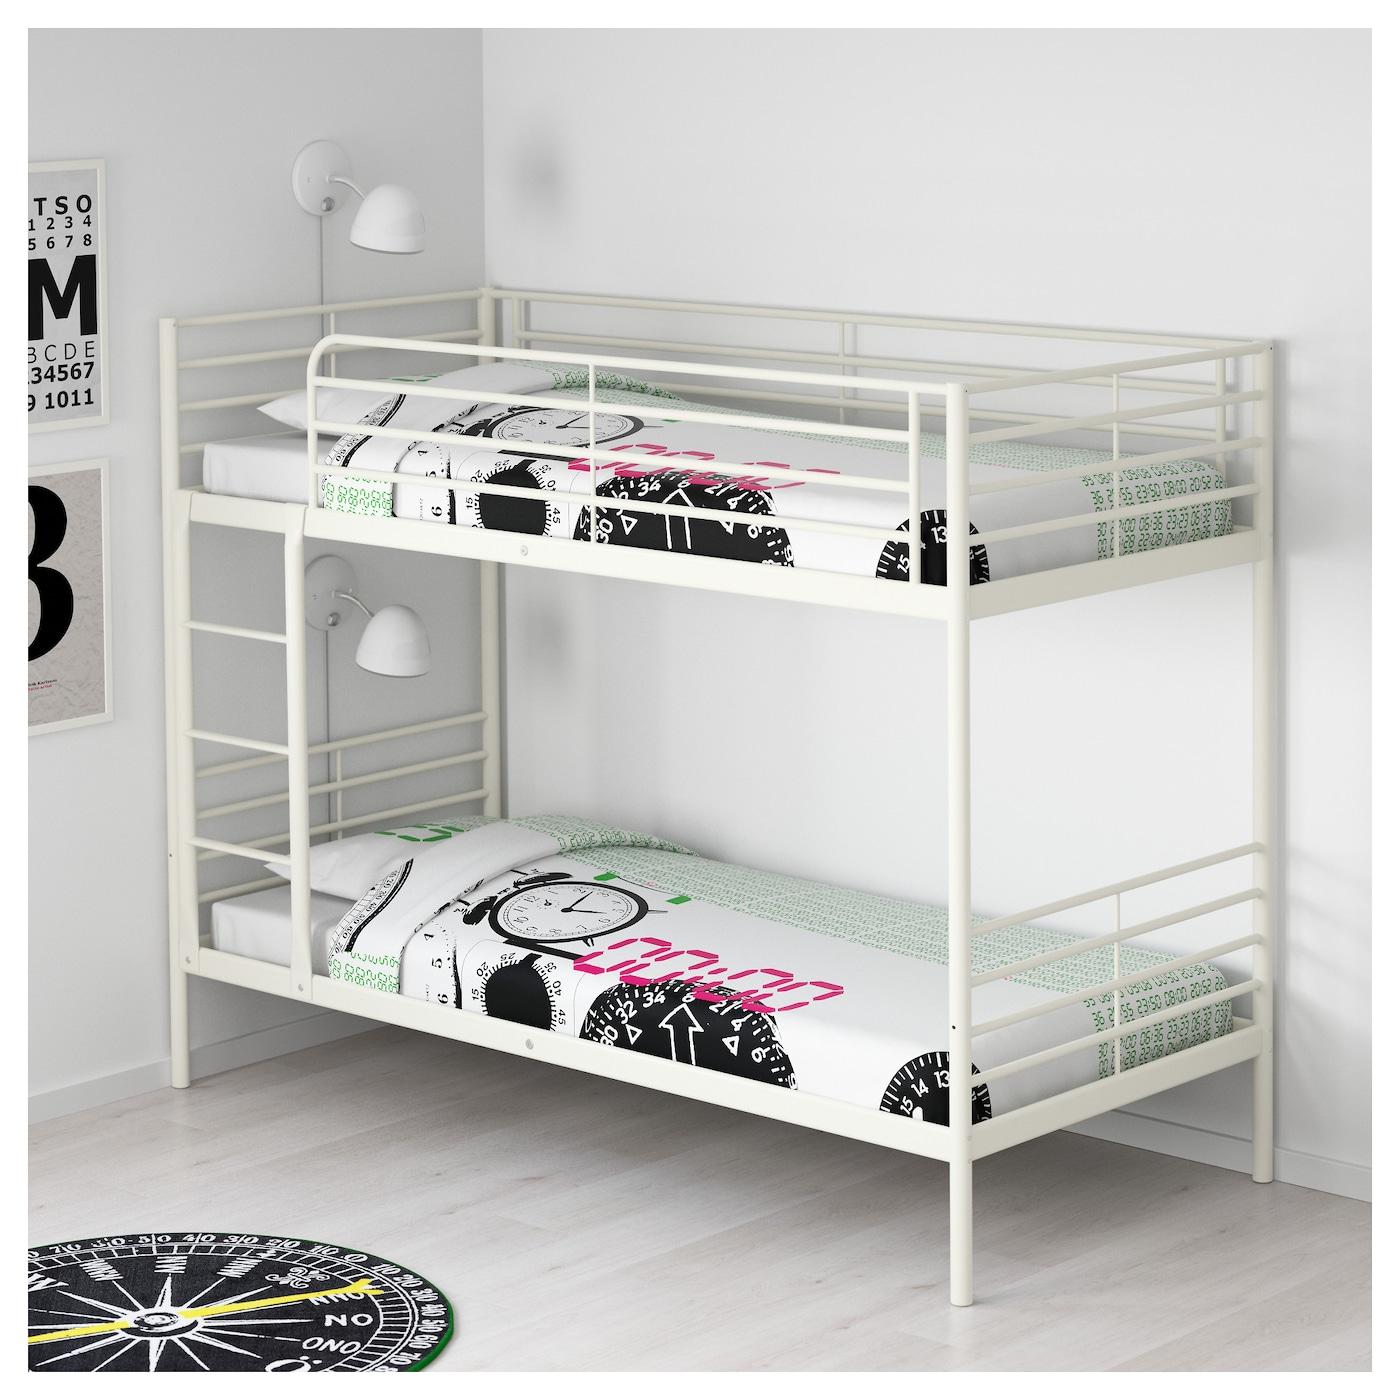 Svärta Estructura De Litera Blanco 90 X 200 Cm Ikea